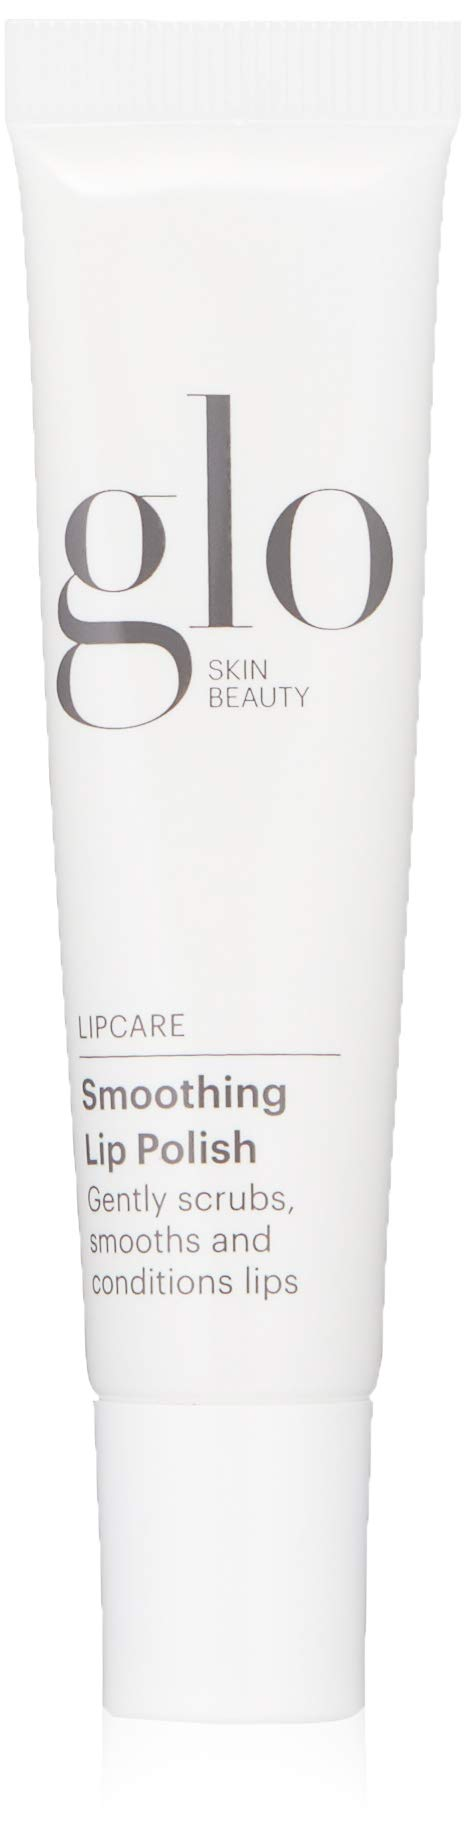 Glo Skin Beauty Smoothing Lip Polish | Gentle Exfoliating Sugar Scrub for Lips | Environmentally-Friendly